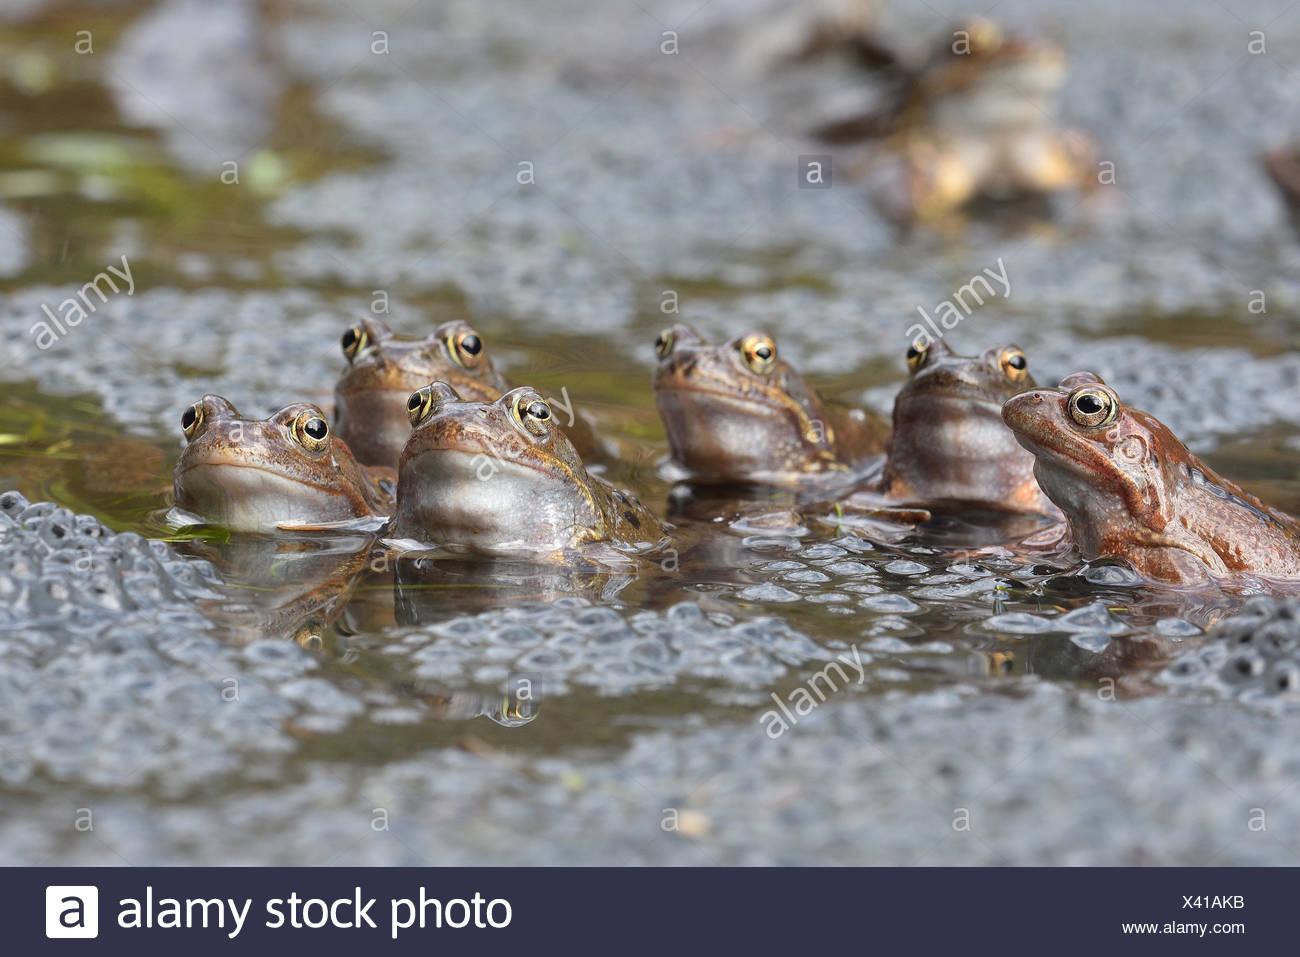 Common European Frog (Rana temporaria) - Stock Image